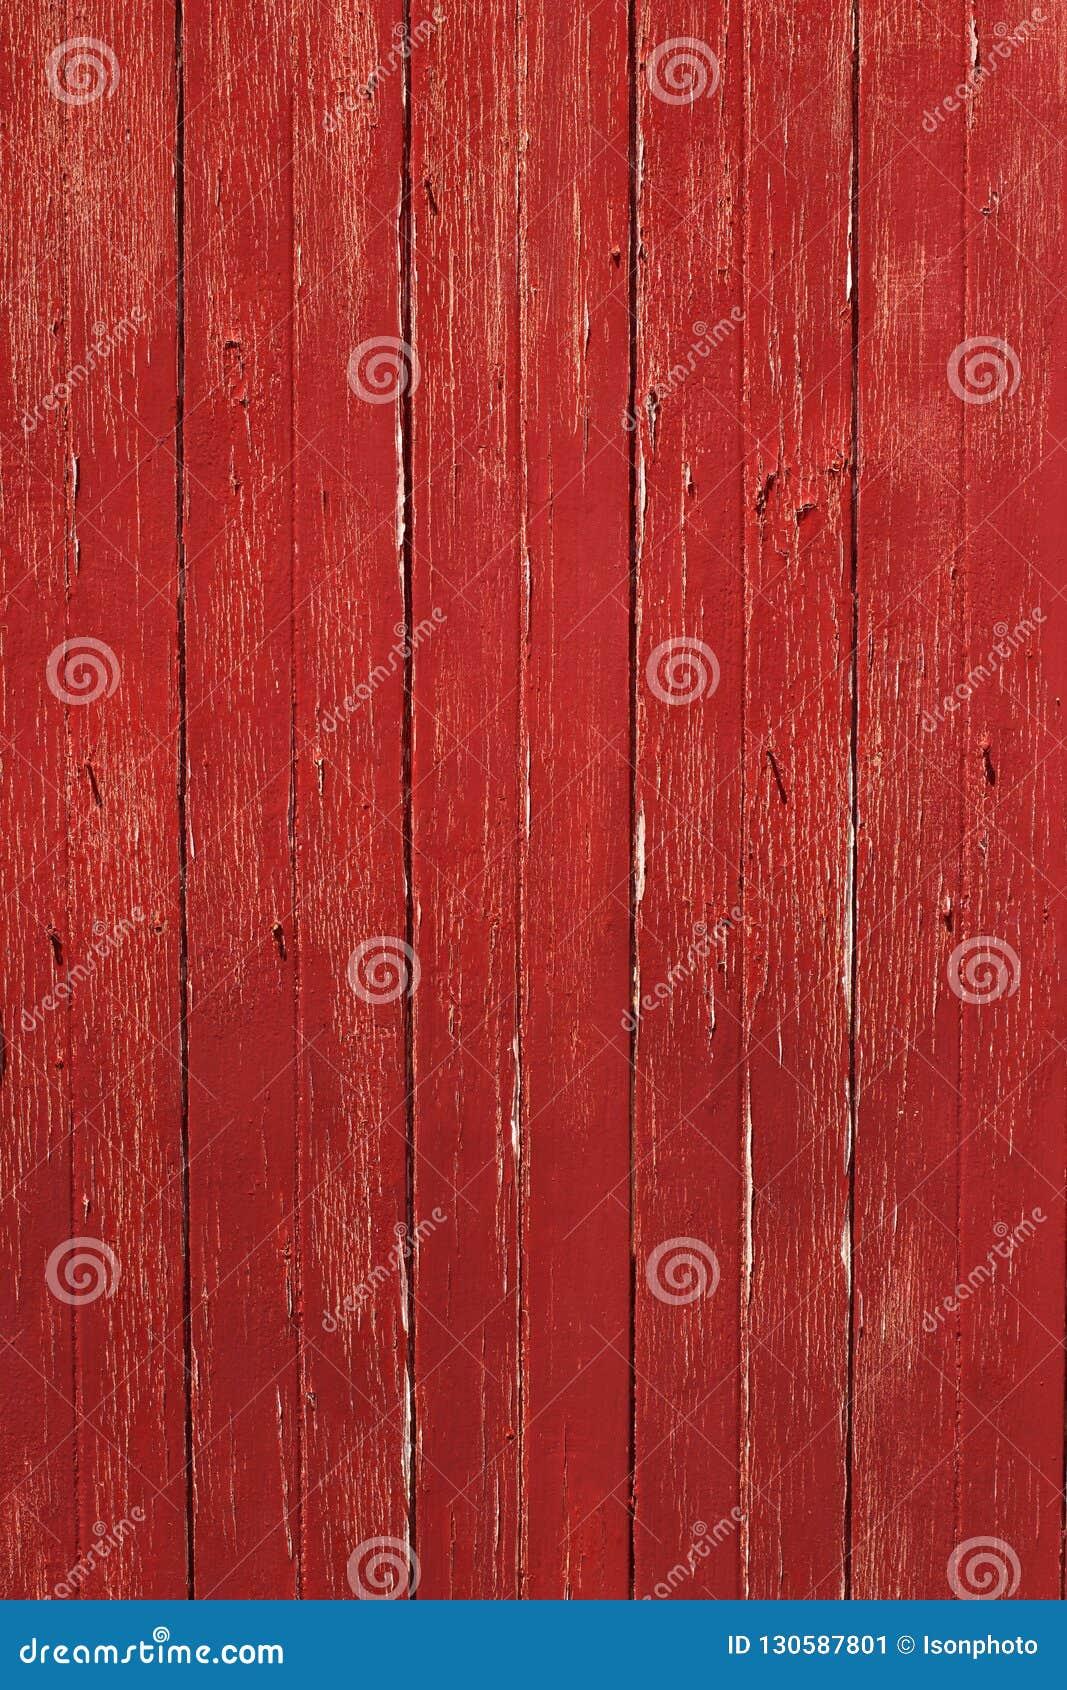 Vertikal lantlig röd timmerdörr